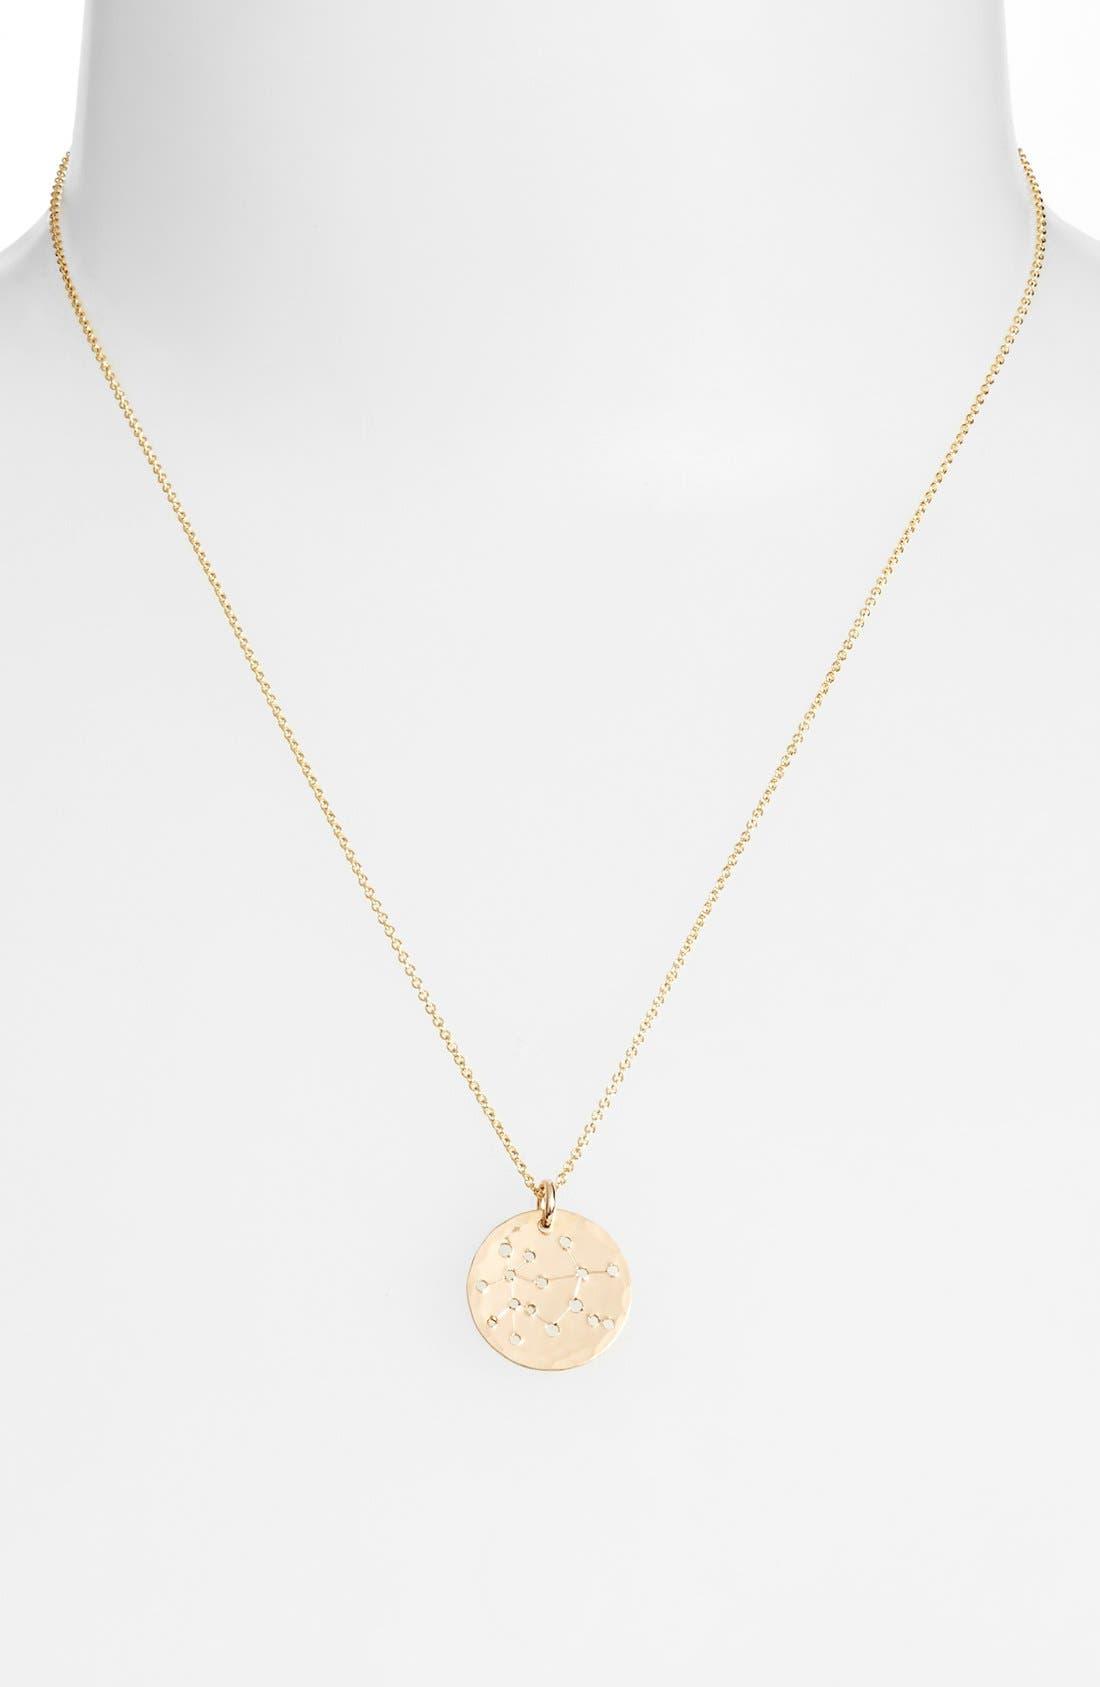 Ija 'Small Zodiac' 14k-Gold Fill Necklace,                             Alternate thumbnail 27, color,